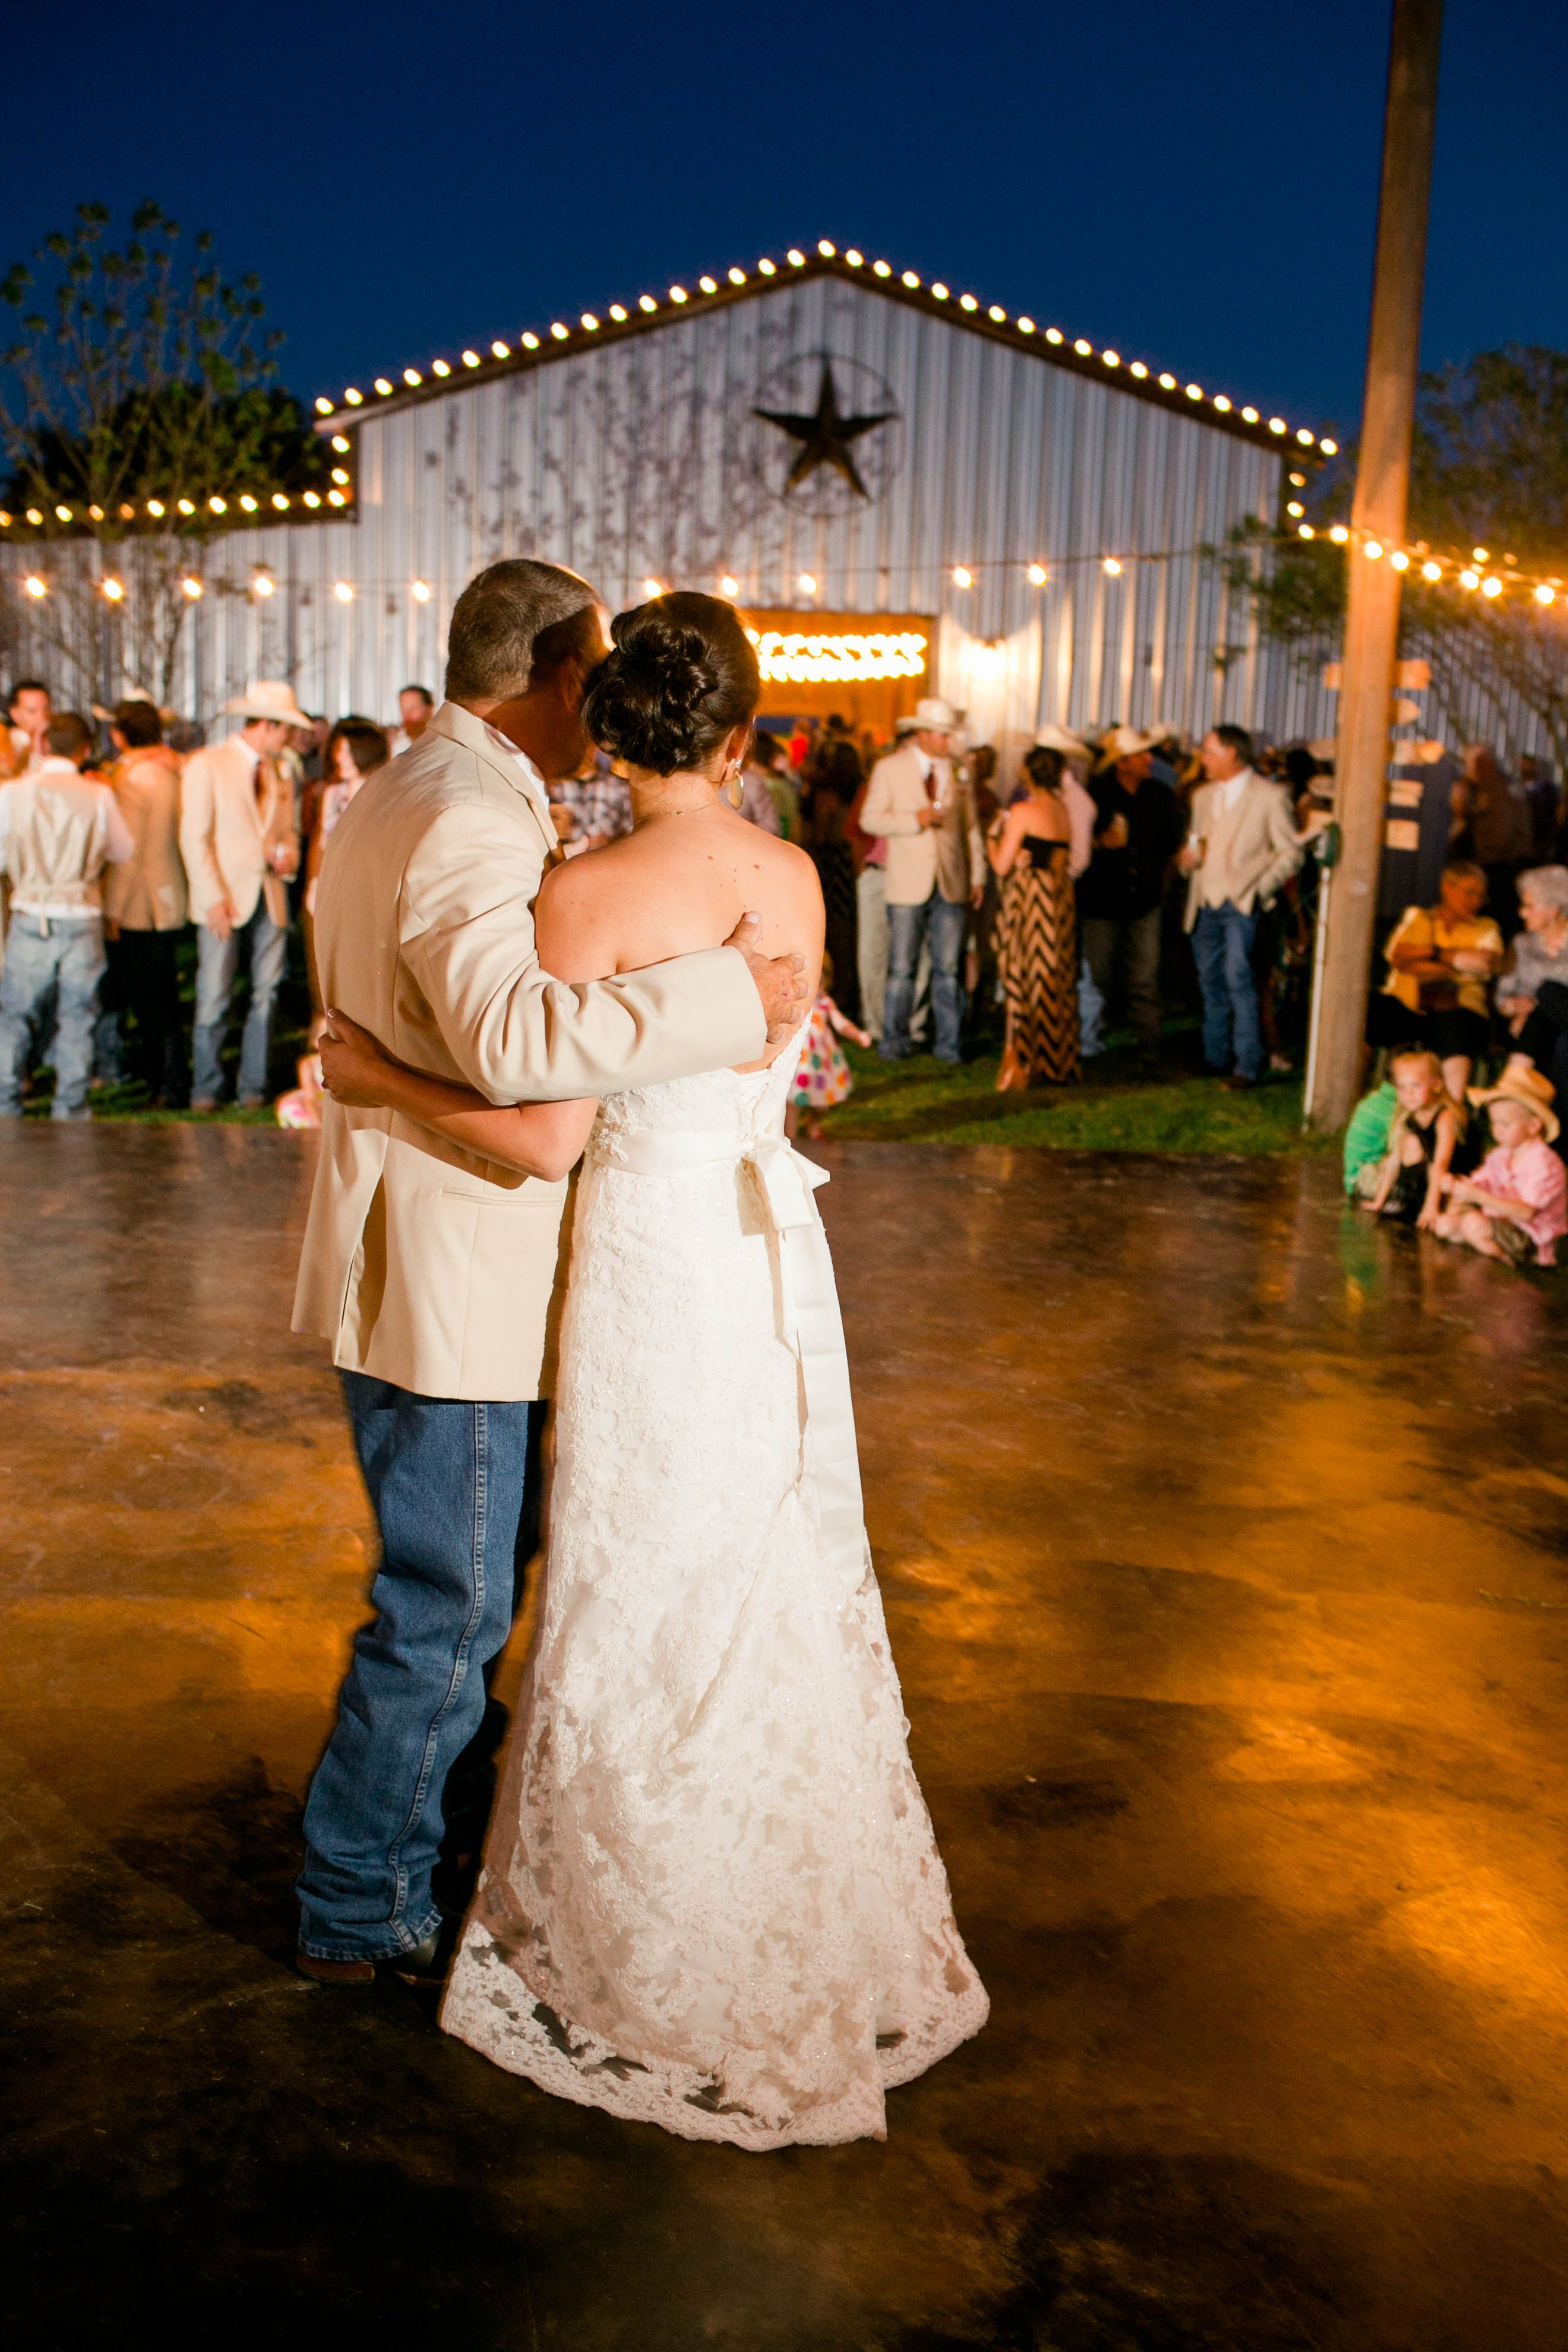 Wied Wedding At Cotton Creek Lubbock Tx Wedding Venues Texas Lubbock Texas Wedding Cotton Creek